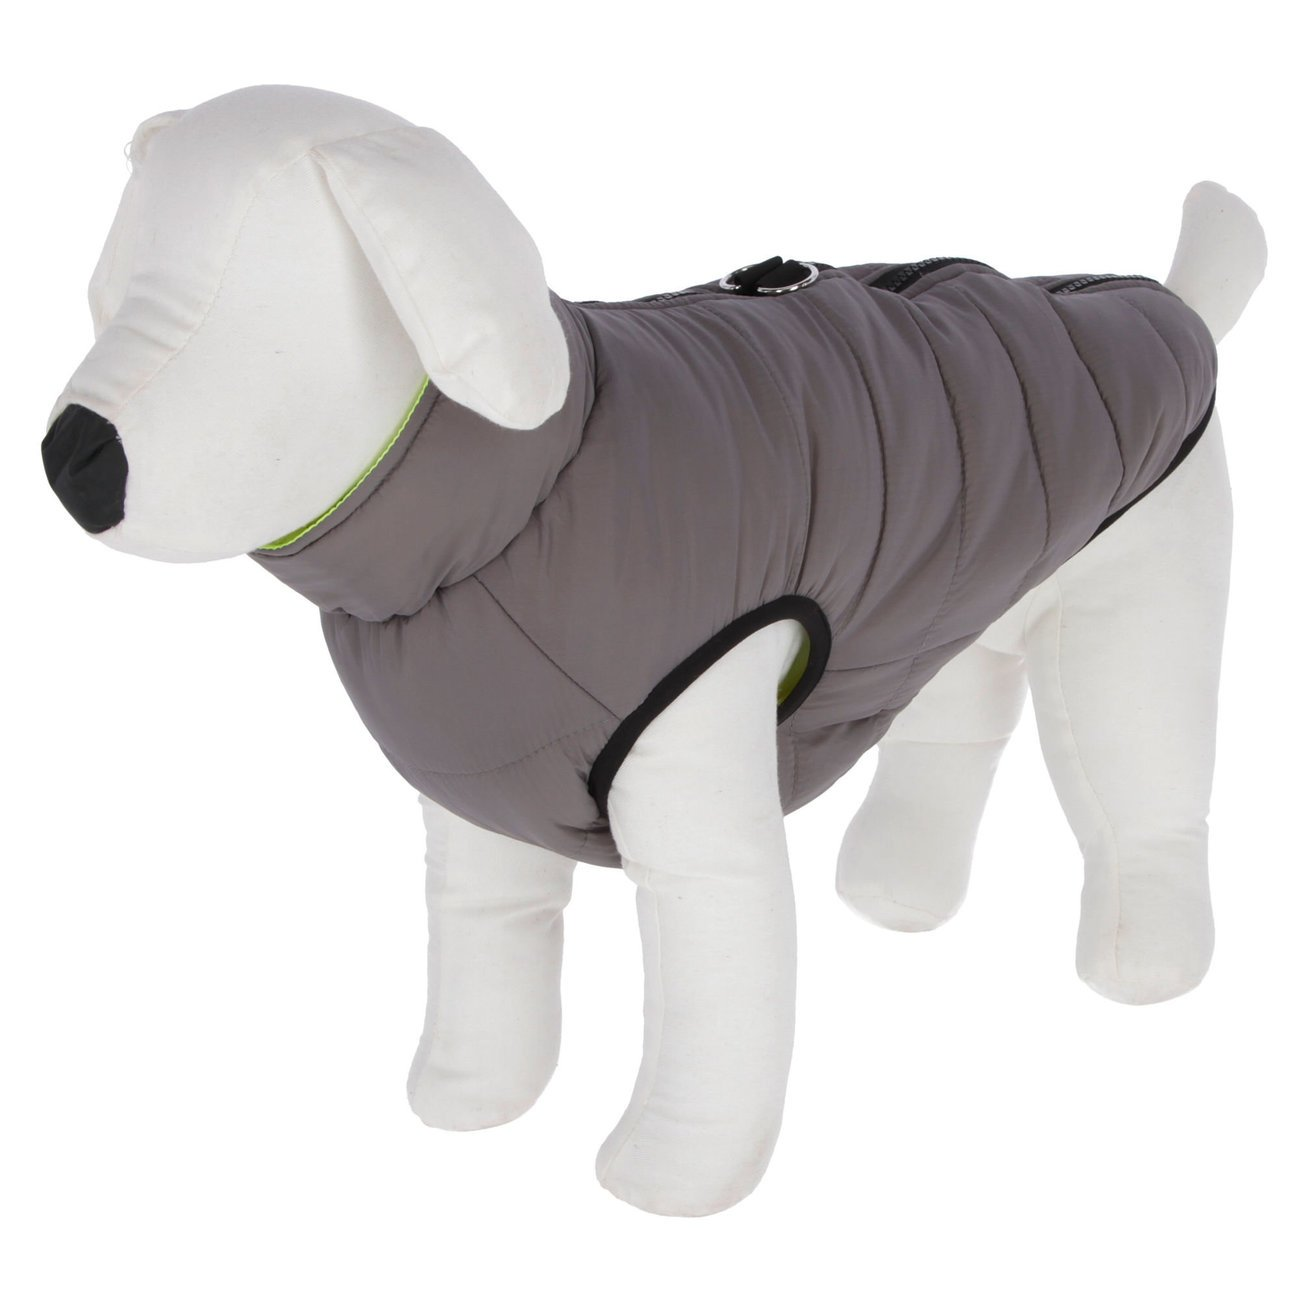 Hunde Steppmantel Wendemantel Charmonix